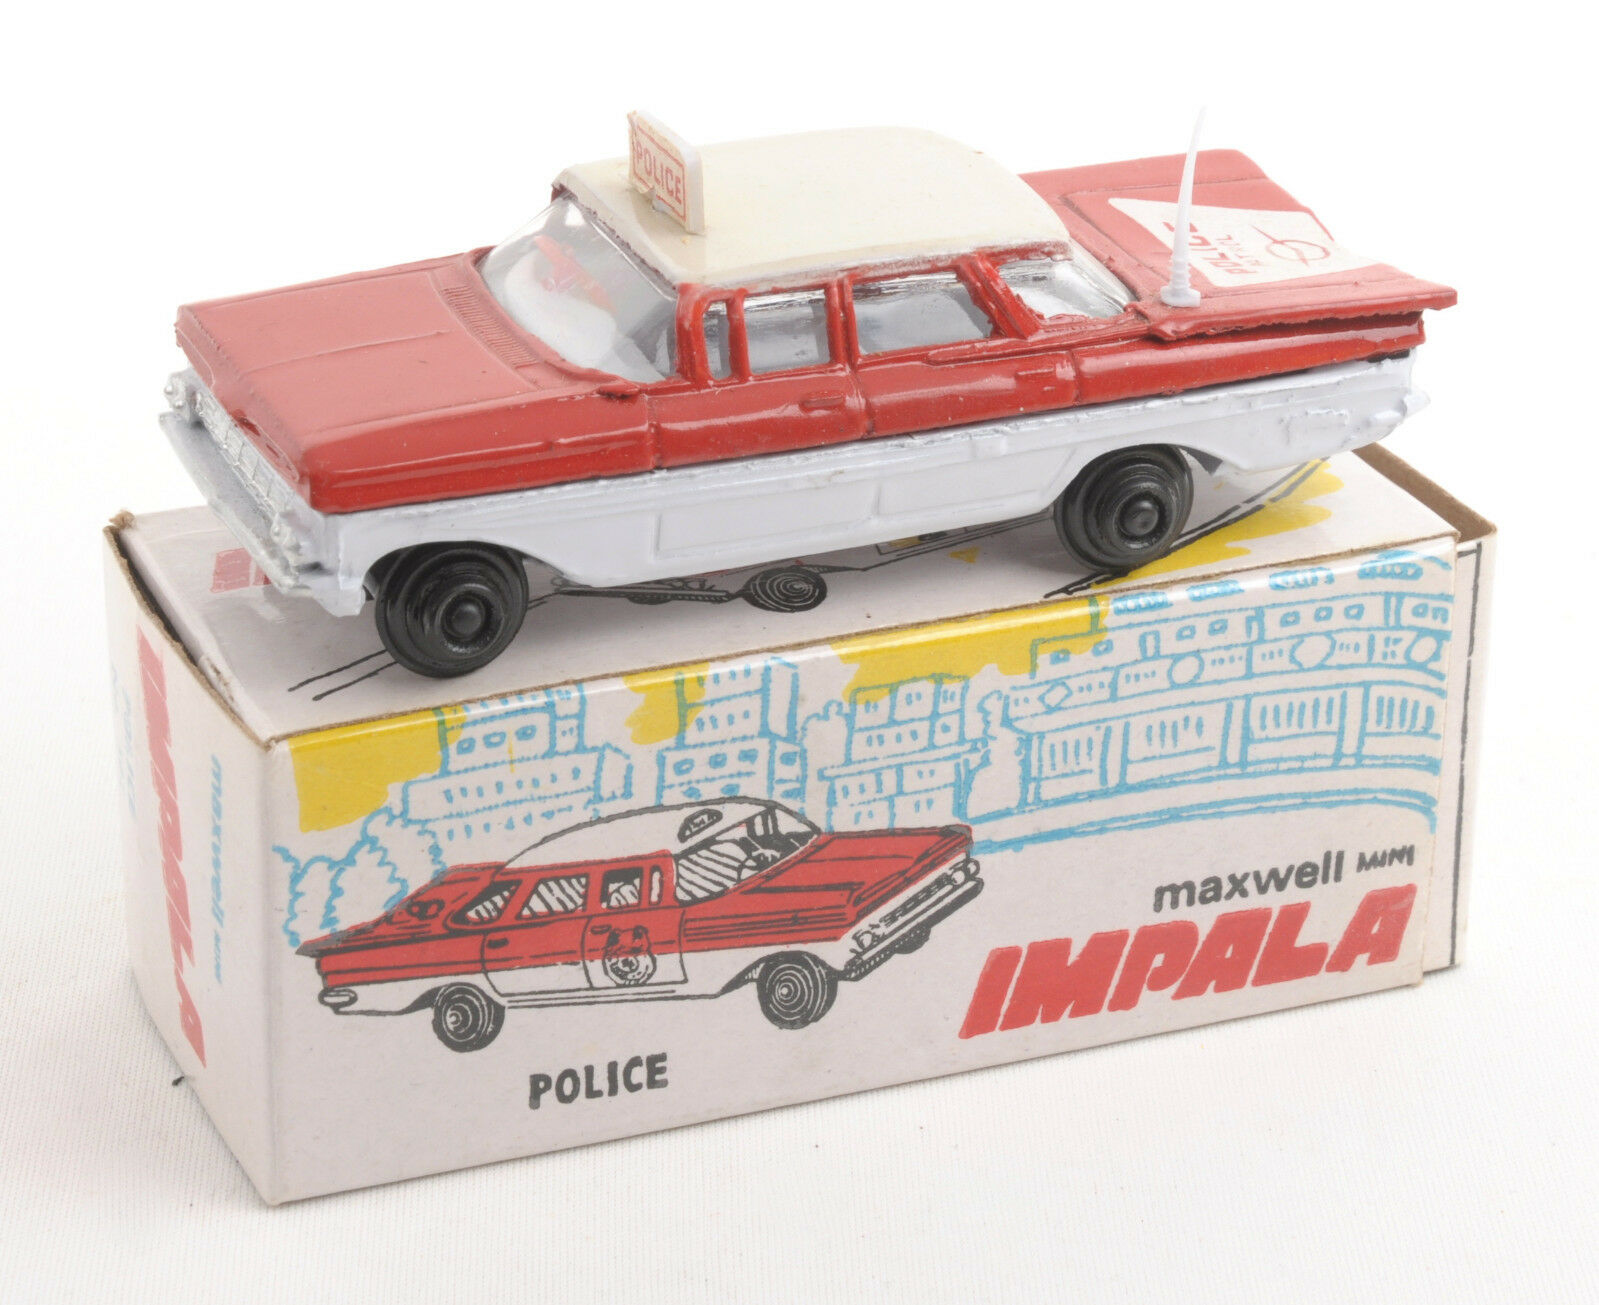 Maxwell Juguetes (India) No.561 Maxwell Mini policía patrulla Impala 1970s   MIB